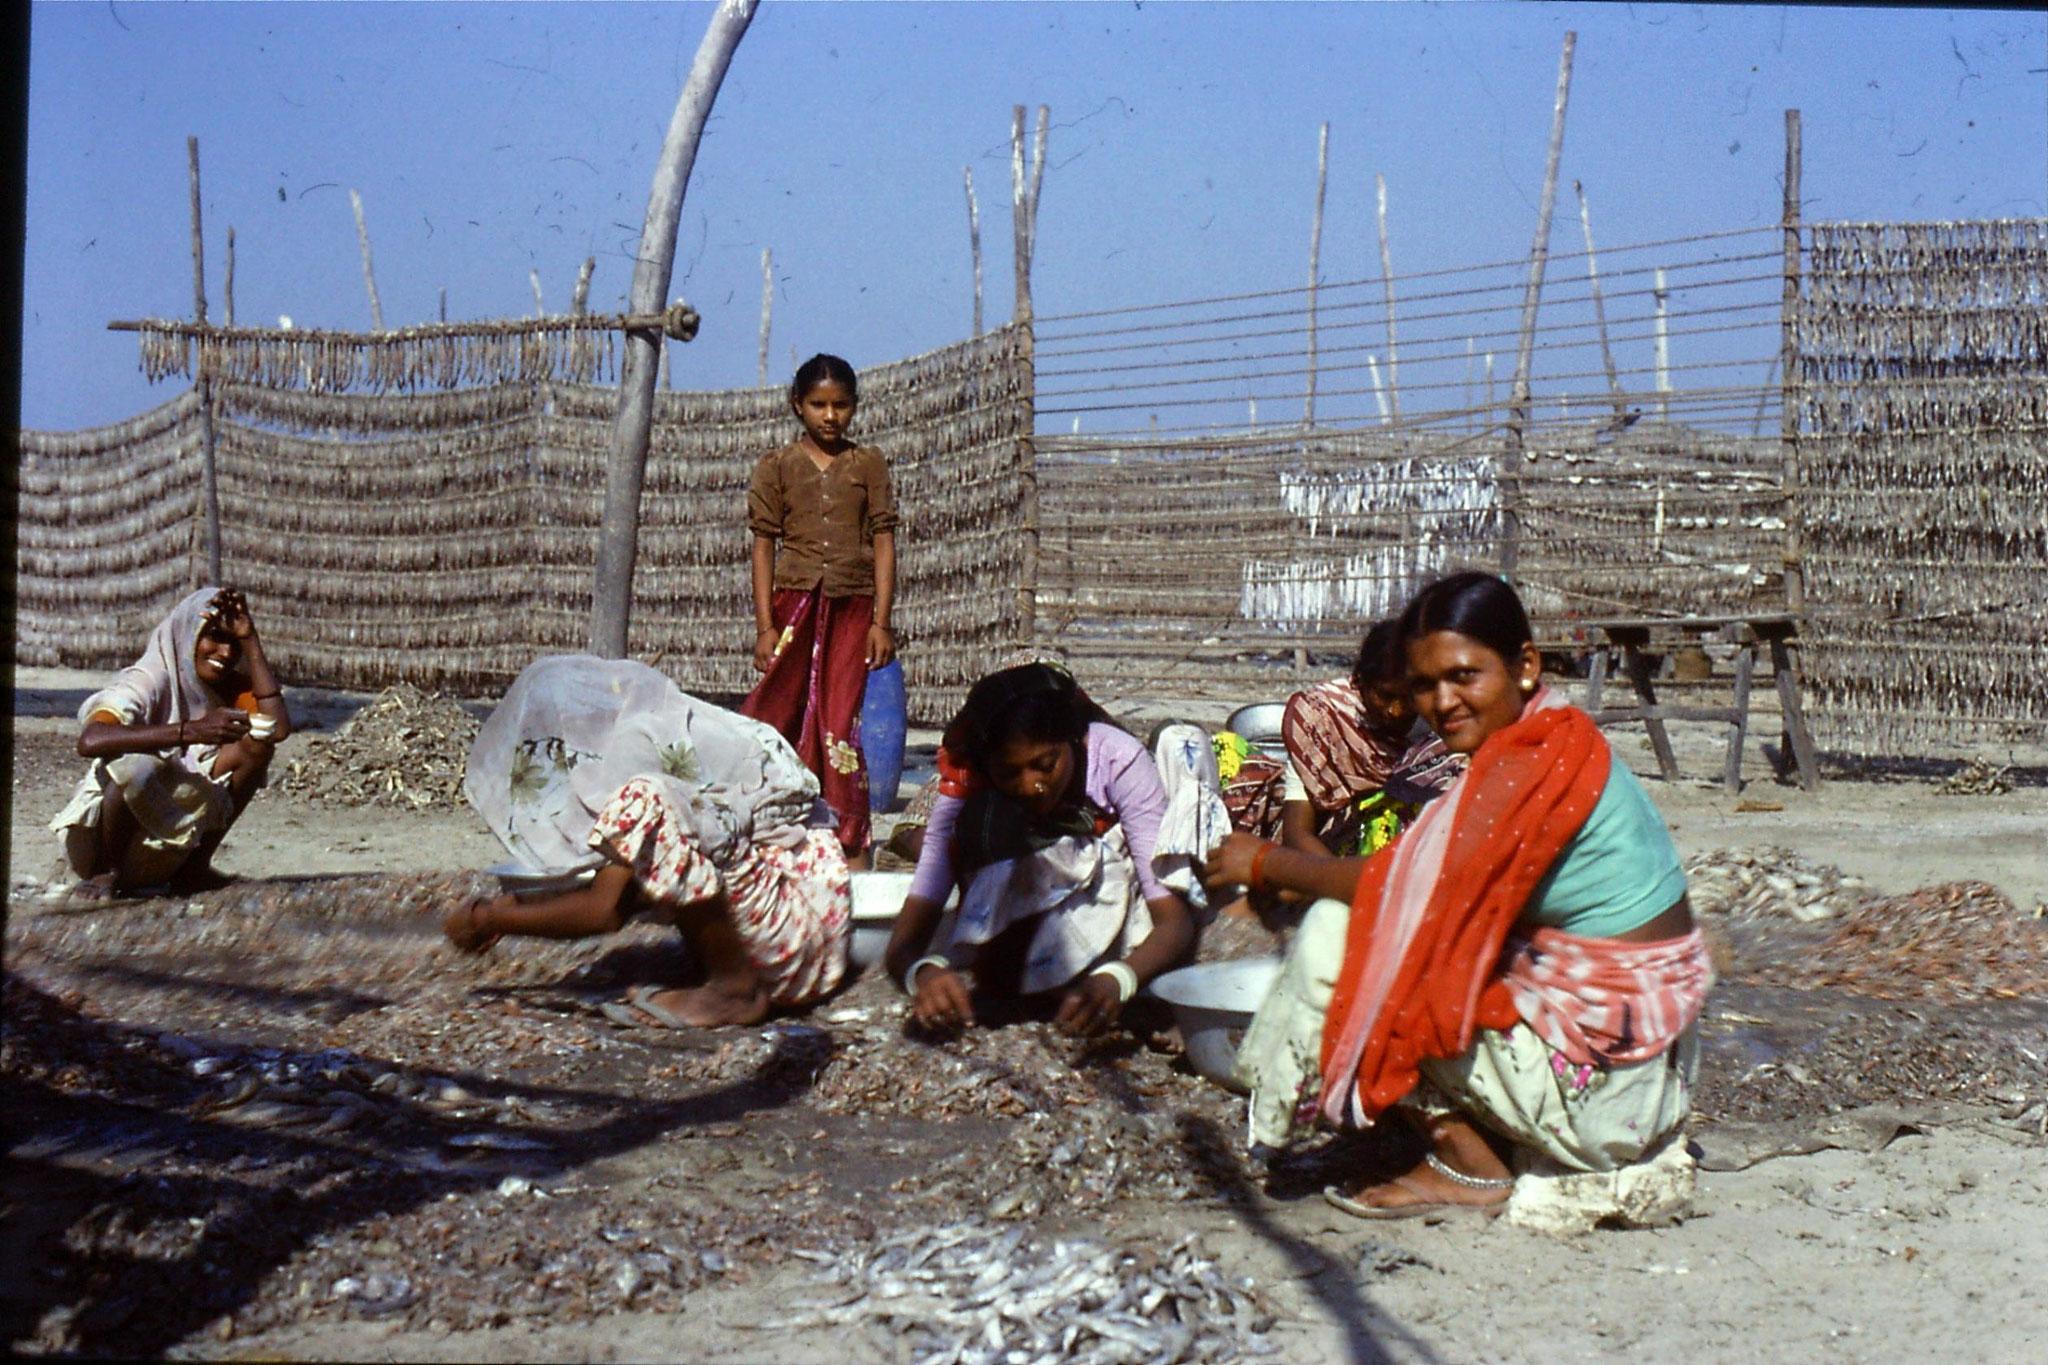 16/12/1989: 9: Diu Goghla fisherwomen